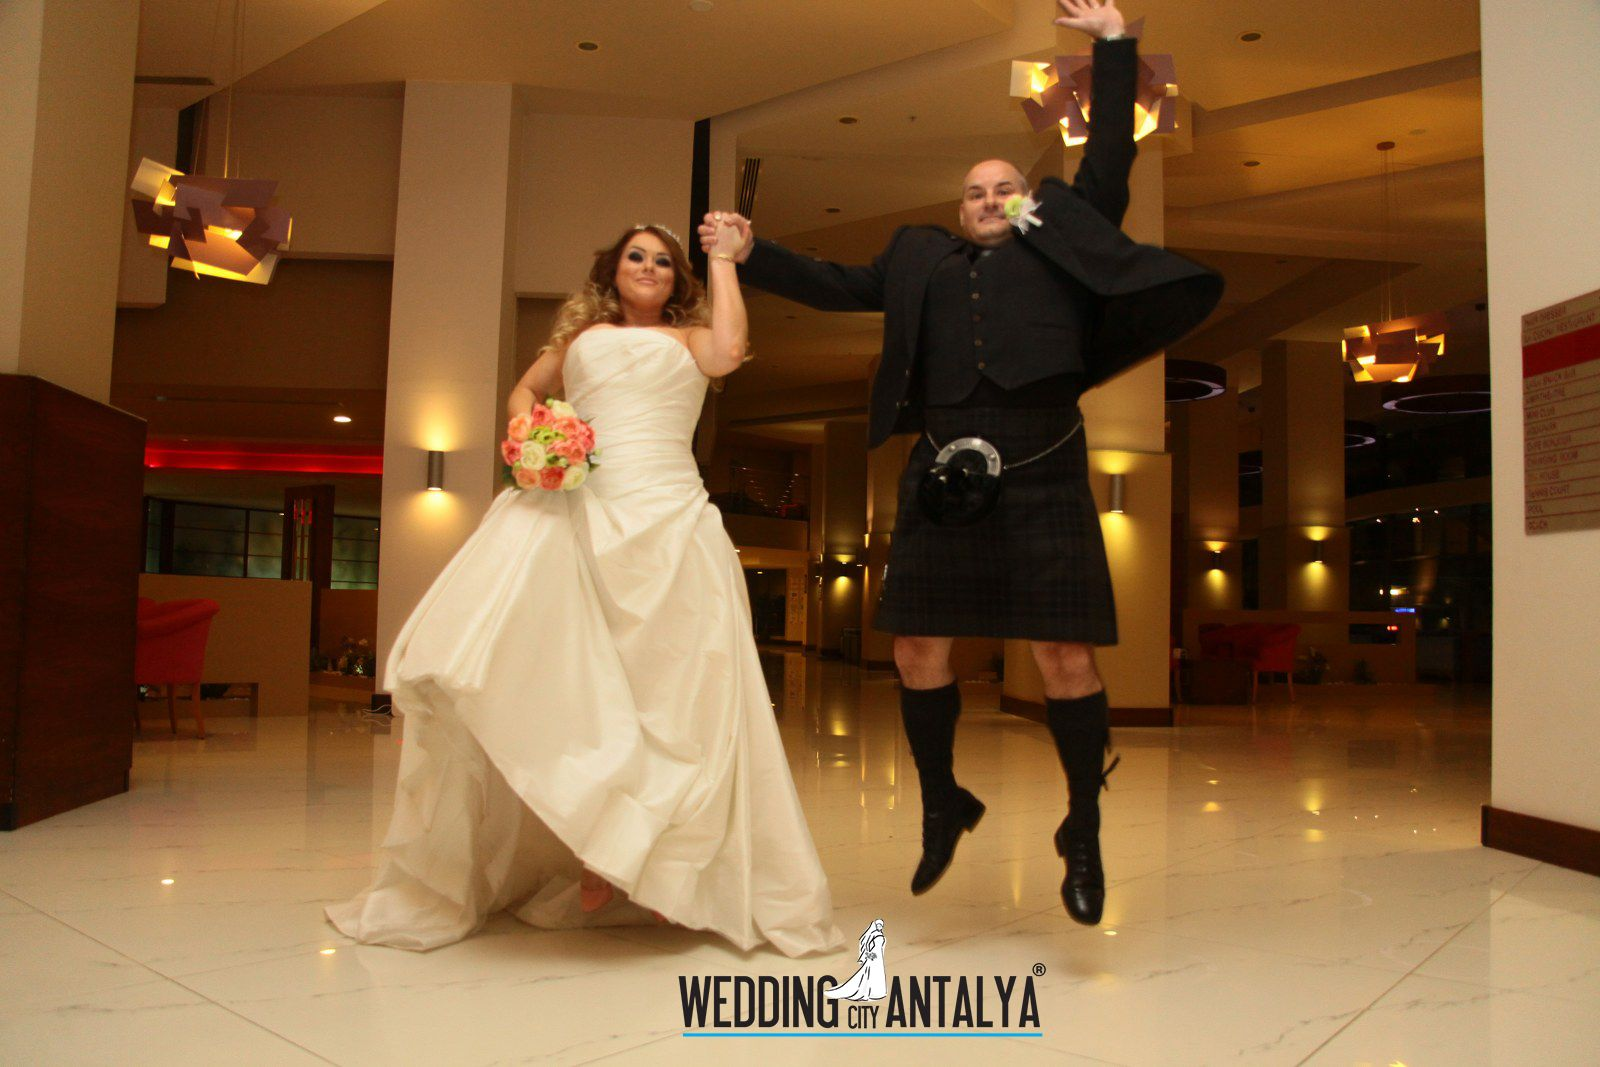 Civil english marriages in turkey antalya brides u wedding in